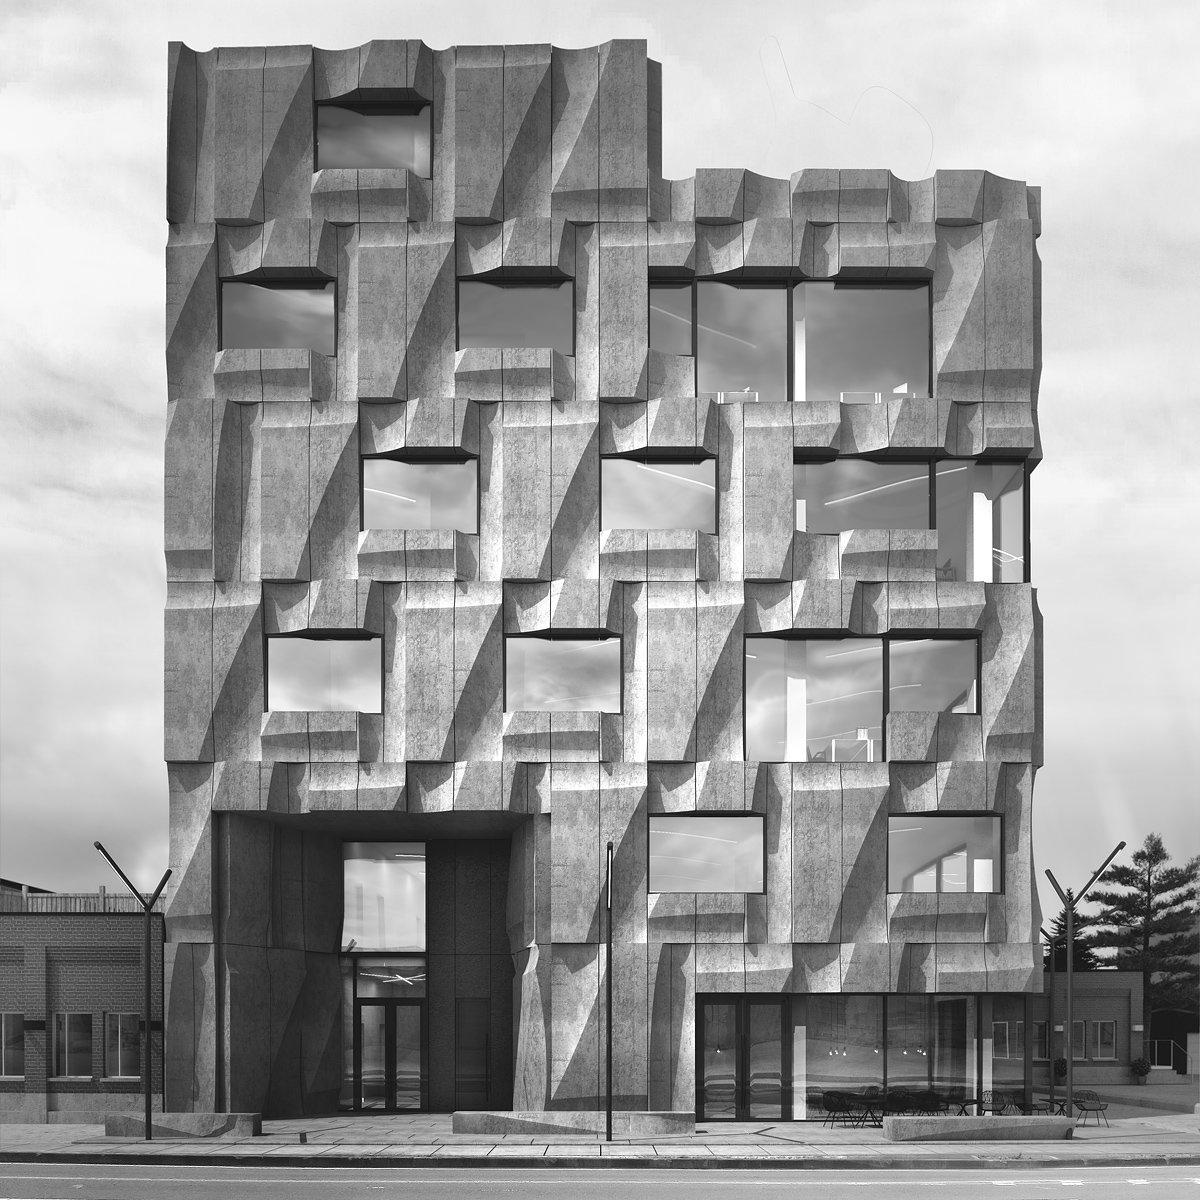 Batay Csorba Architects Reimagines The Precast Concrete